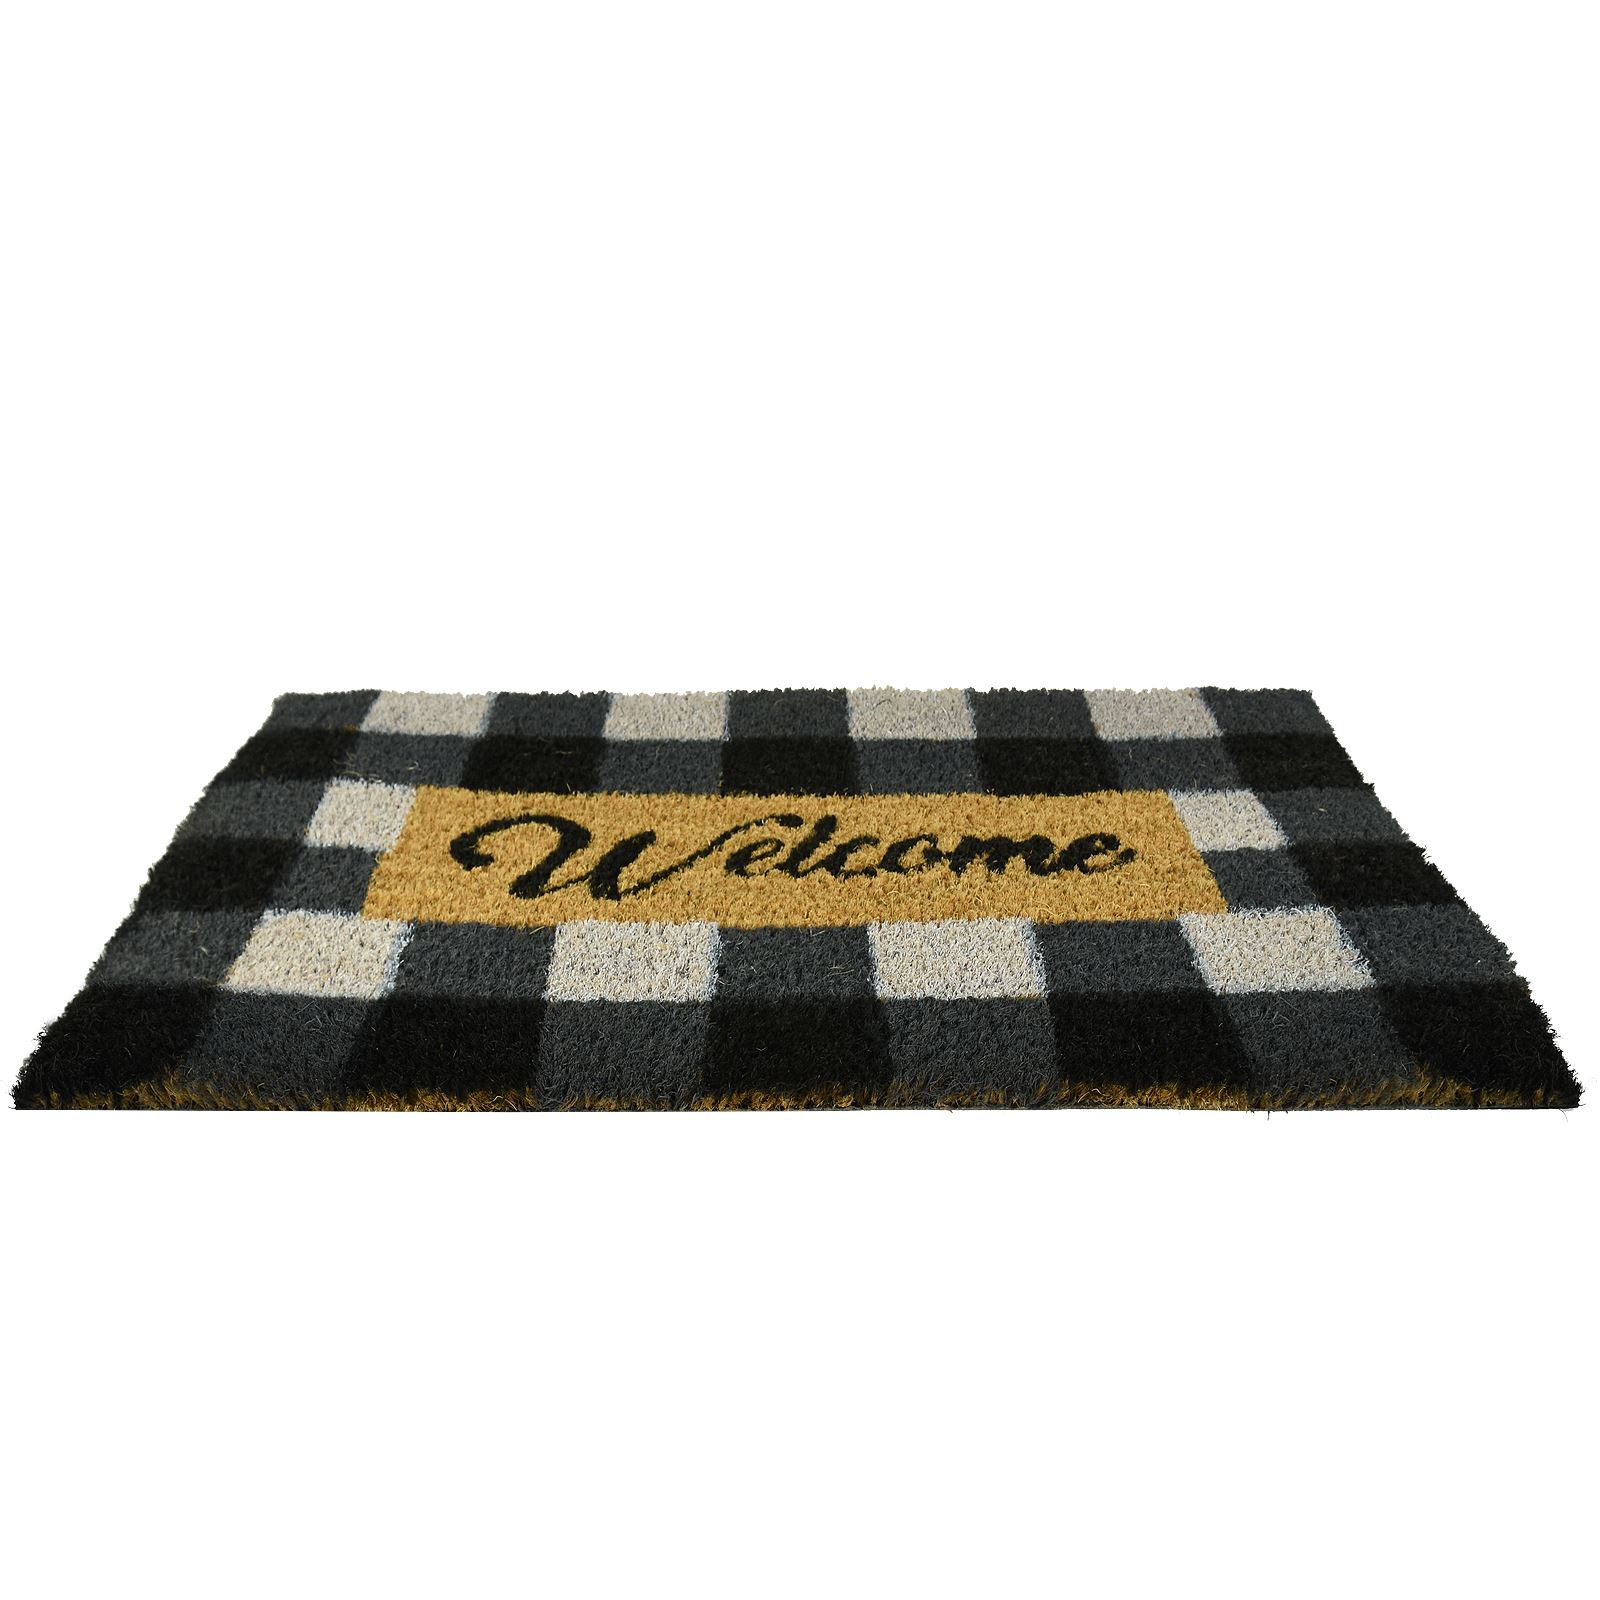 Plain-Non-Slip-Door-Mat-Tough-Natural-Coir-PVC-Back-Welcome-Doormat-40-x-60cm miniatura 15